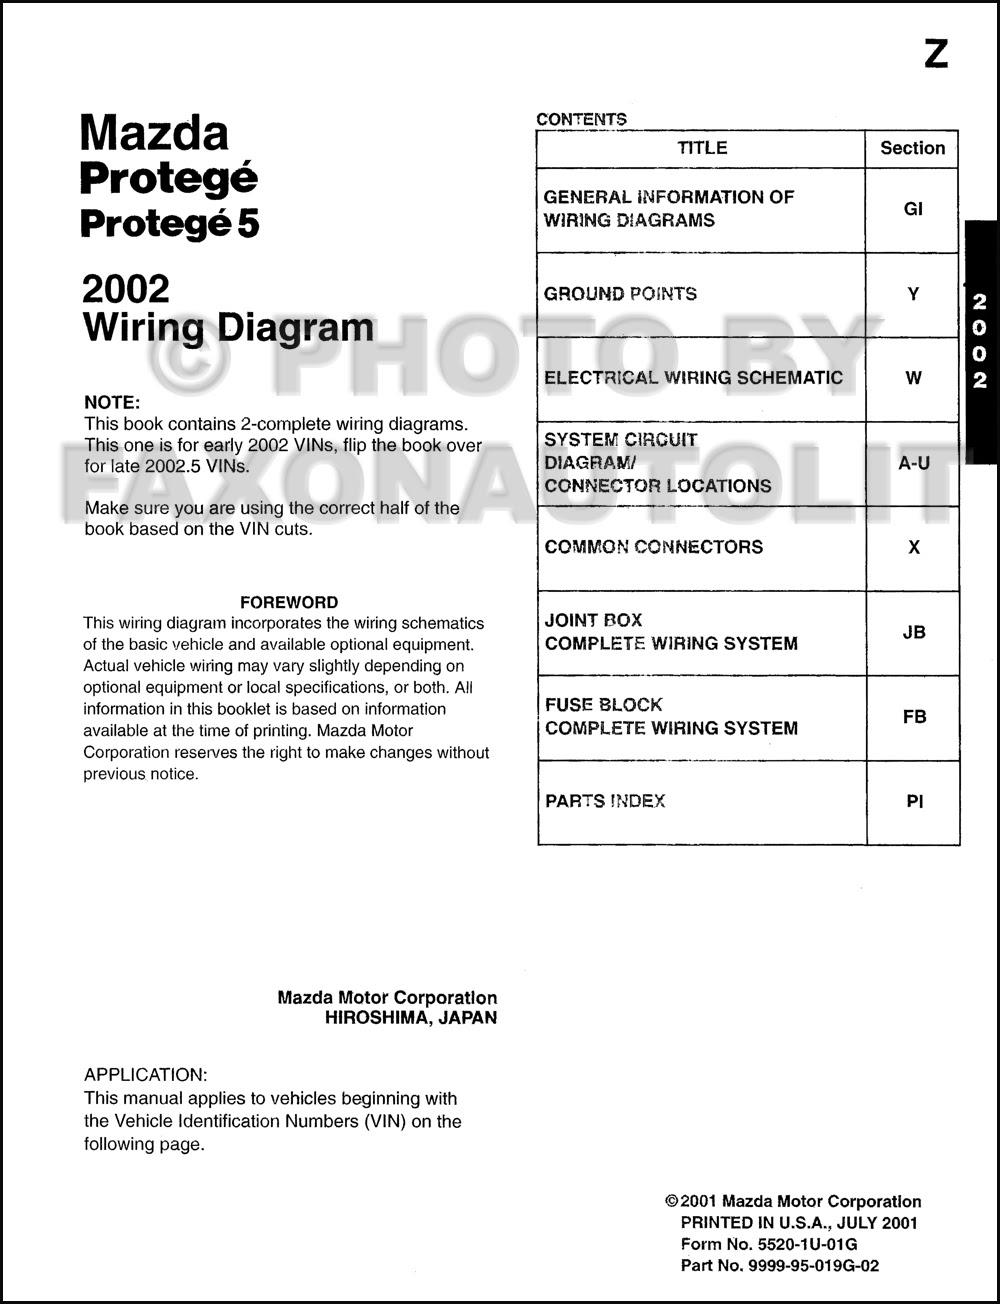 Mazda Protege Diagram Wiring Schematic